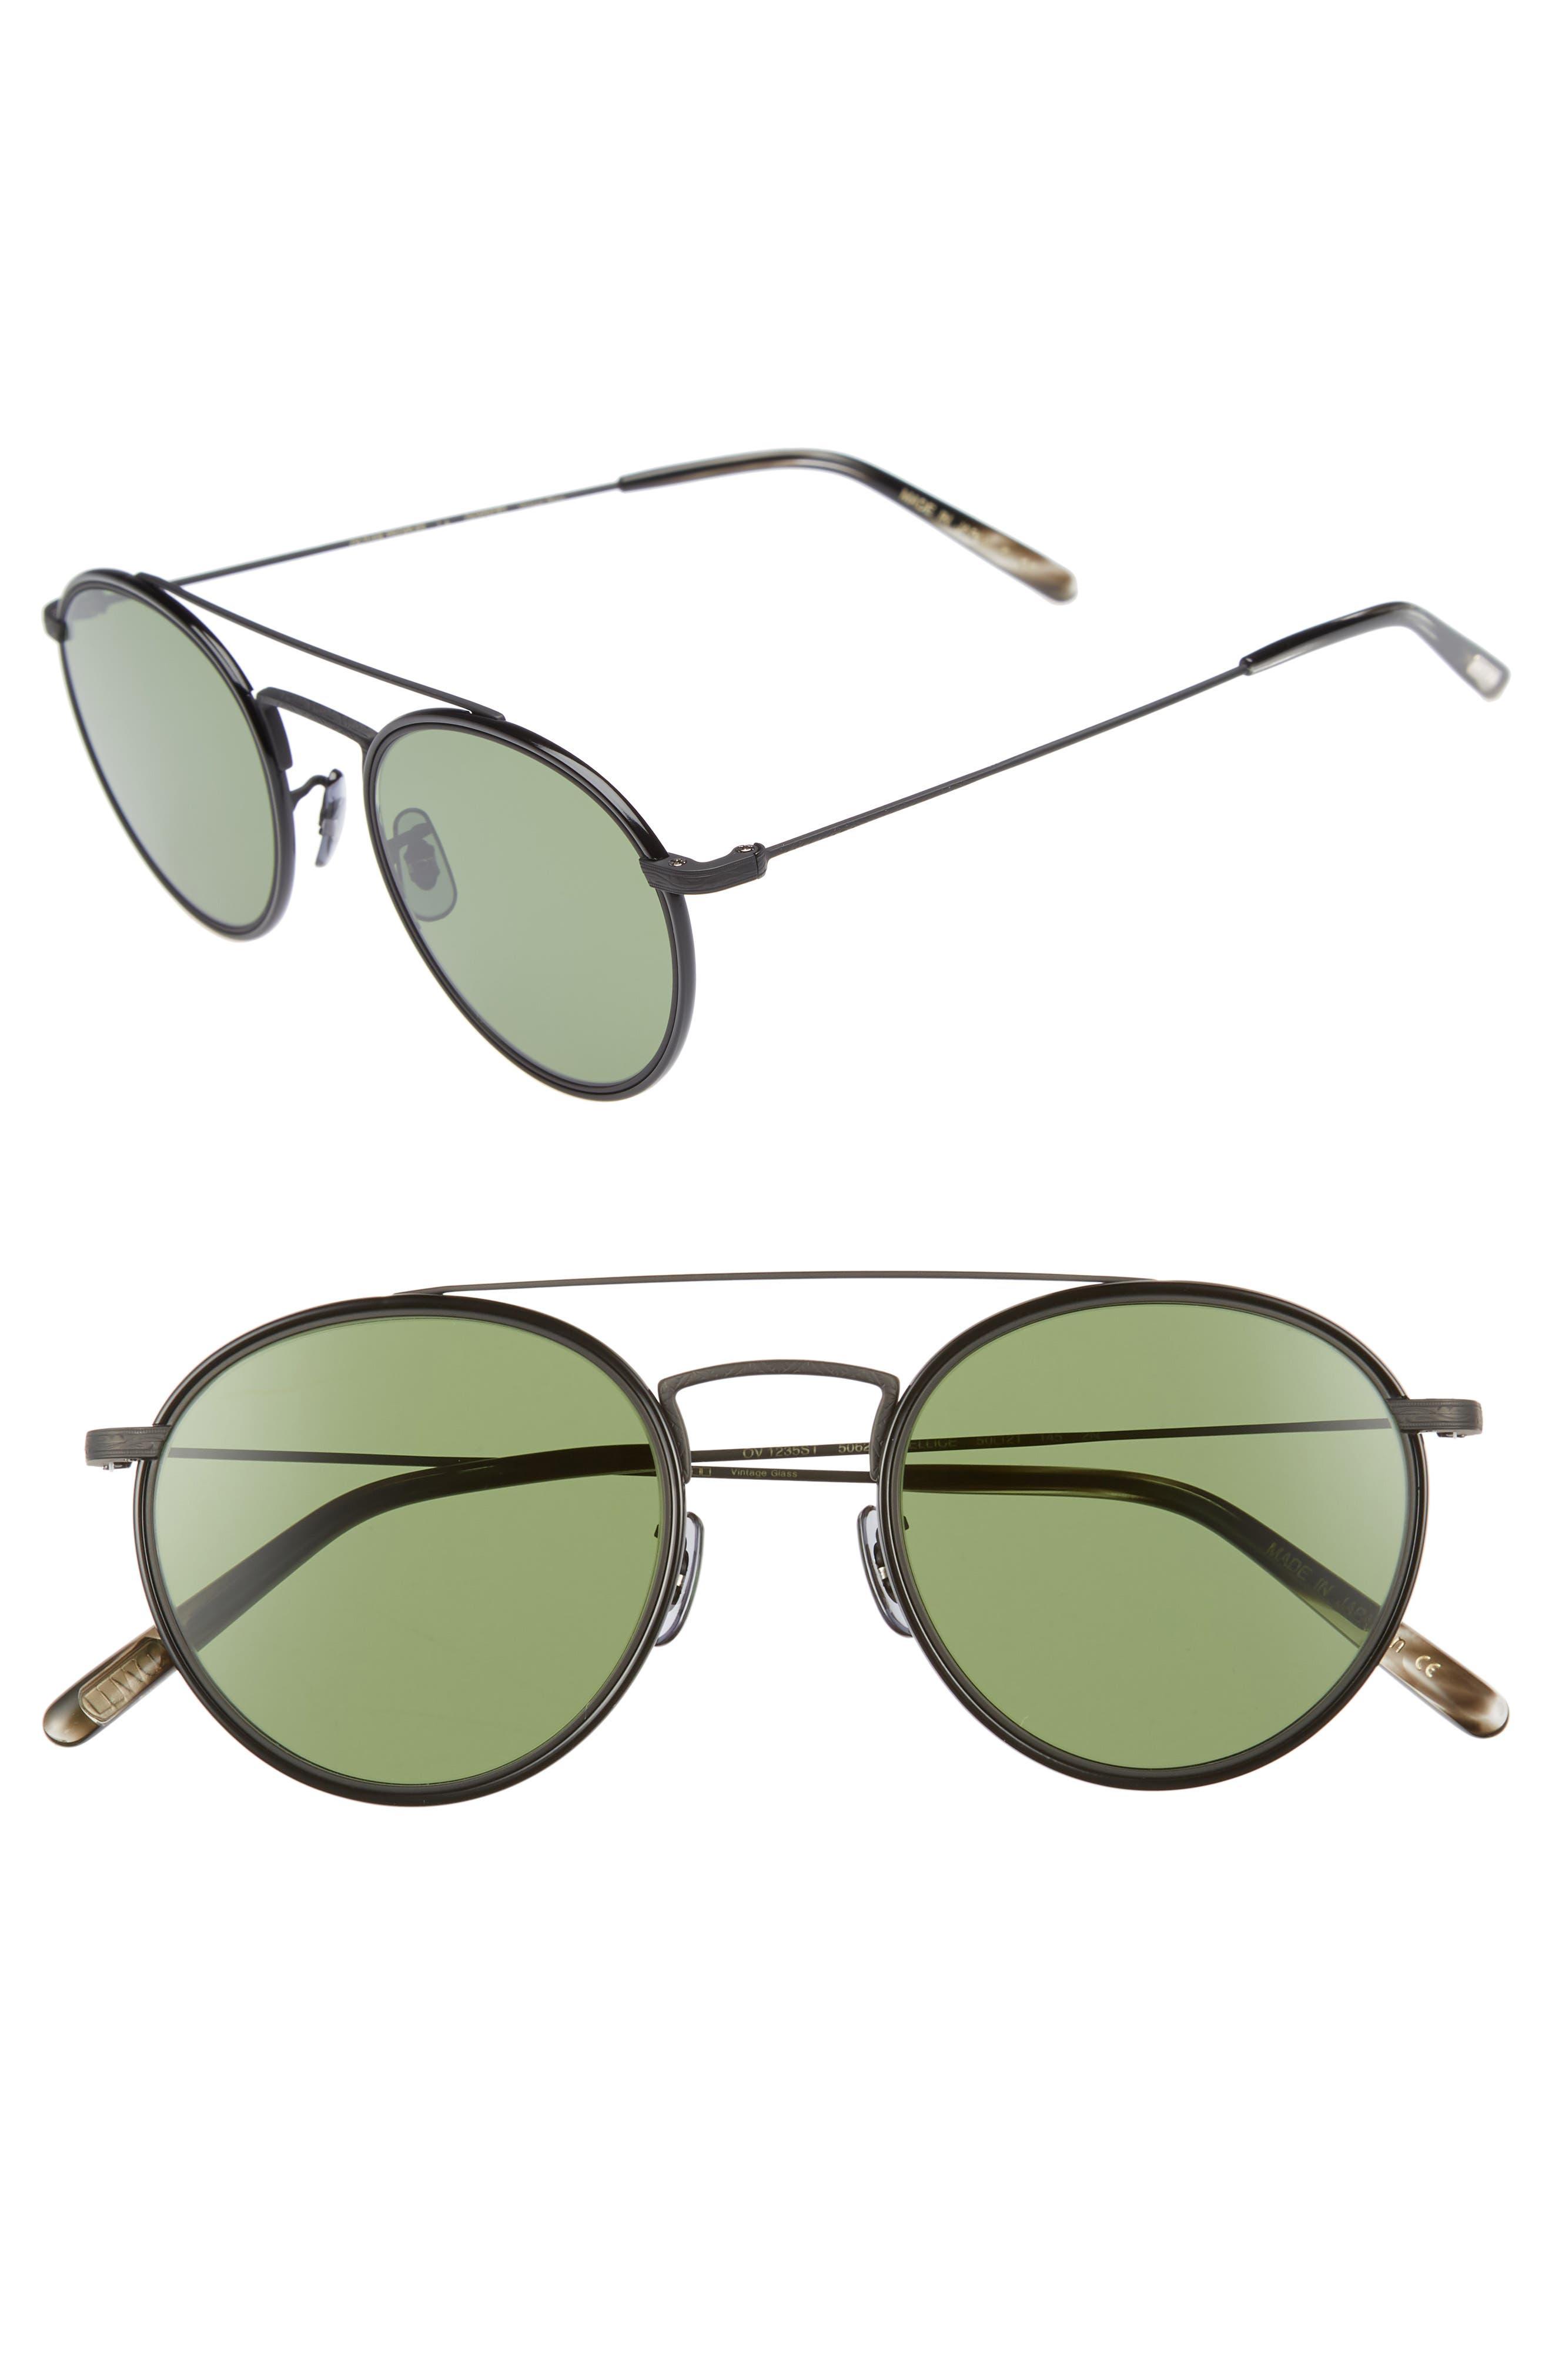 Ellice 50mm Round Sunglasses,                             Main thumbnail 1, color,                             001